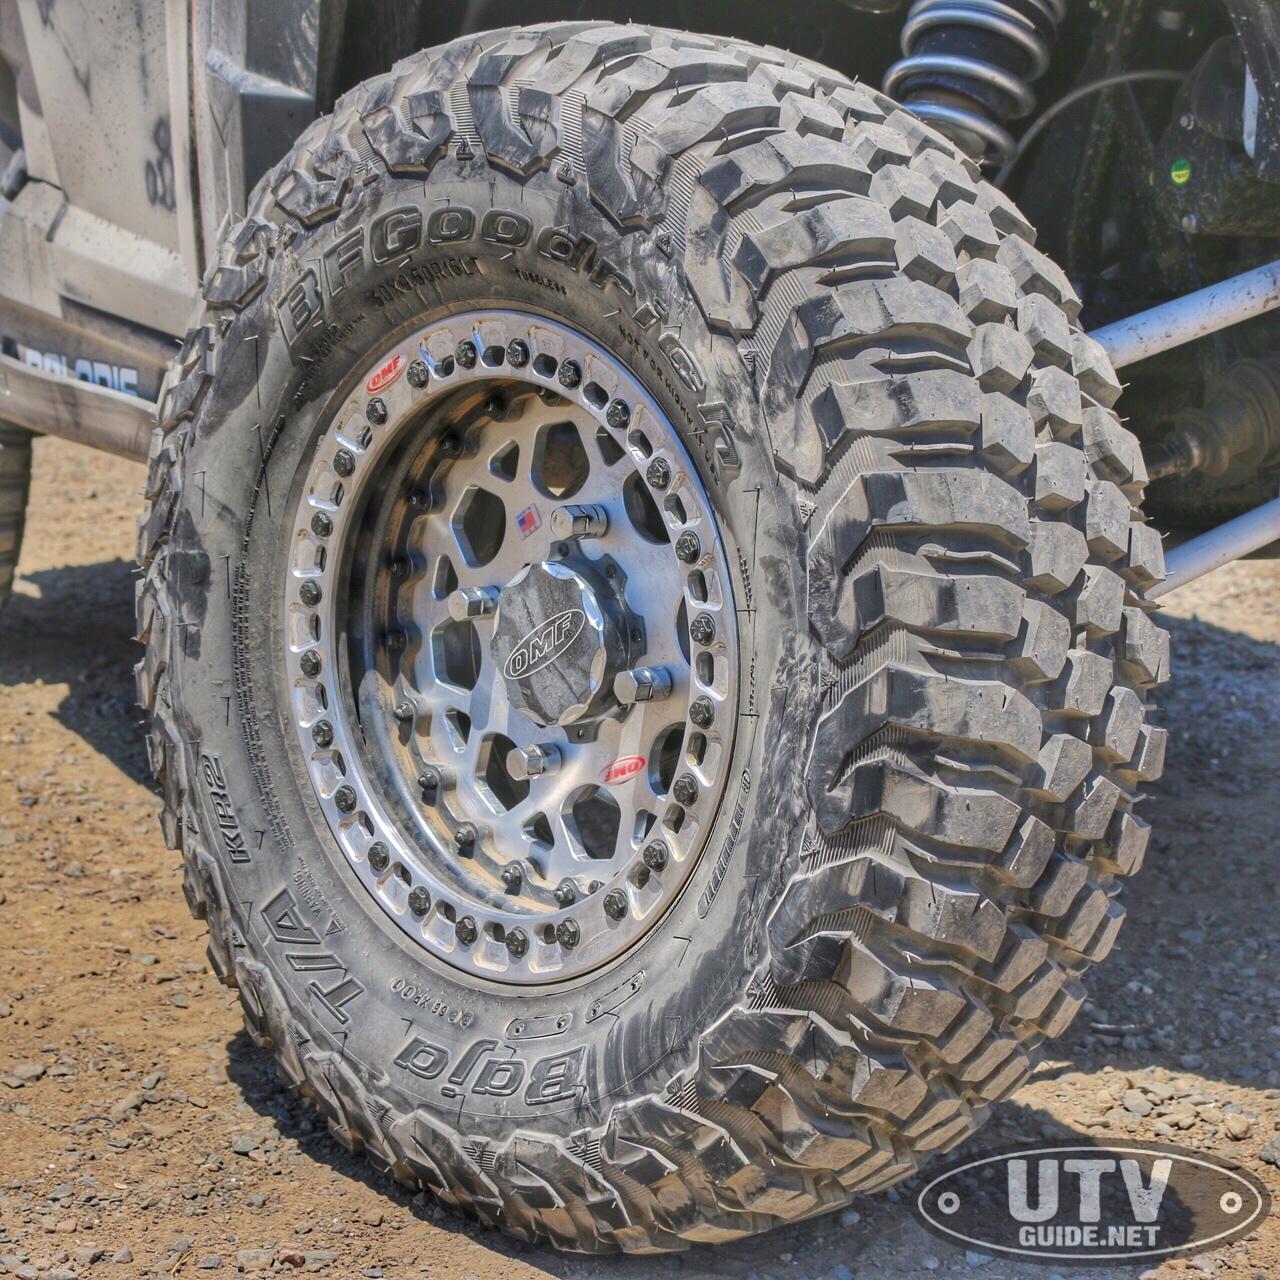 30-inch Tire Shootout 2016 - UTV Guide